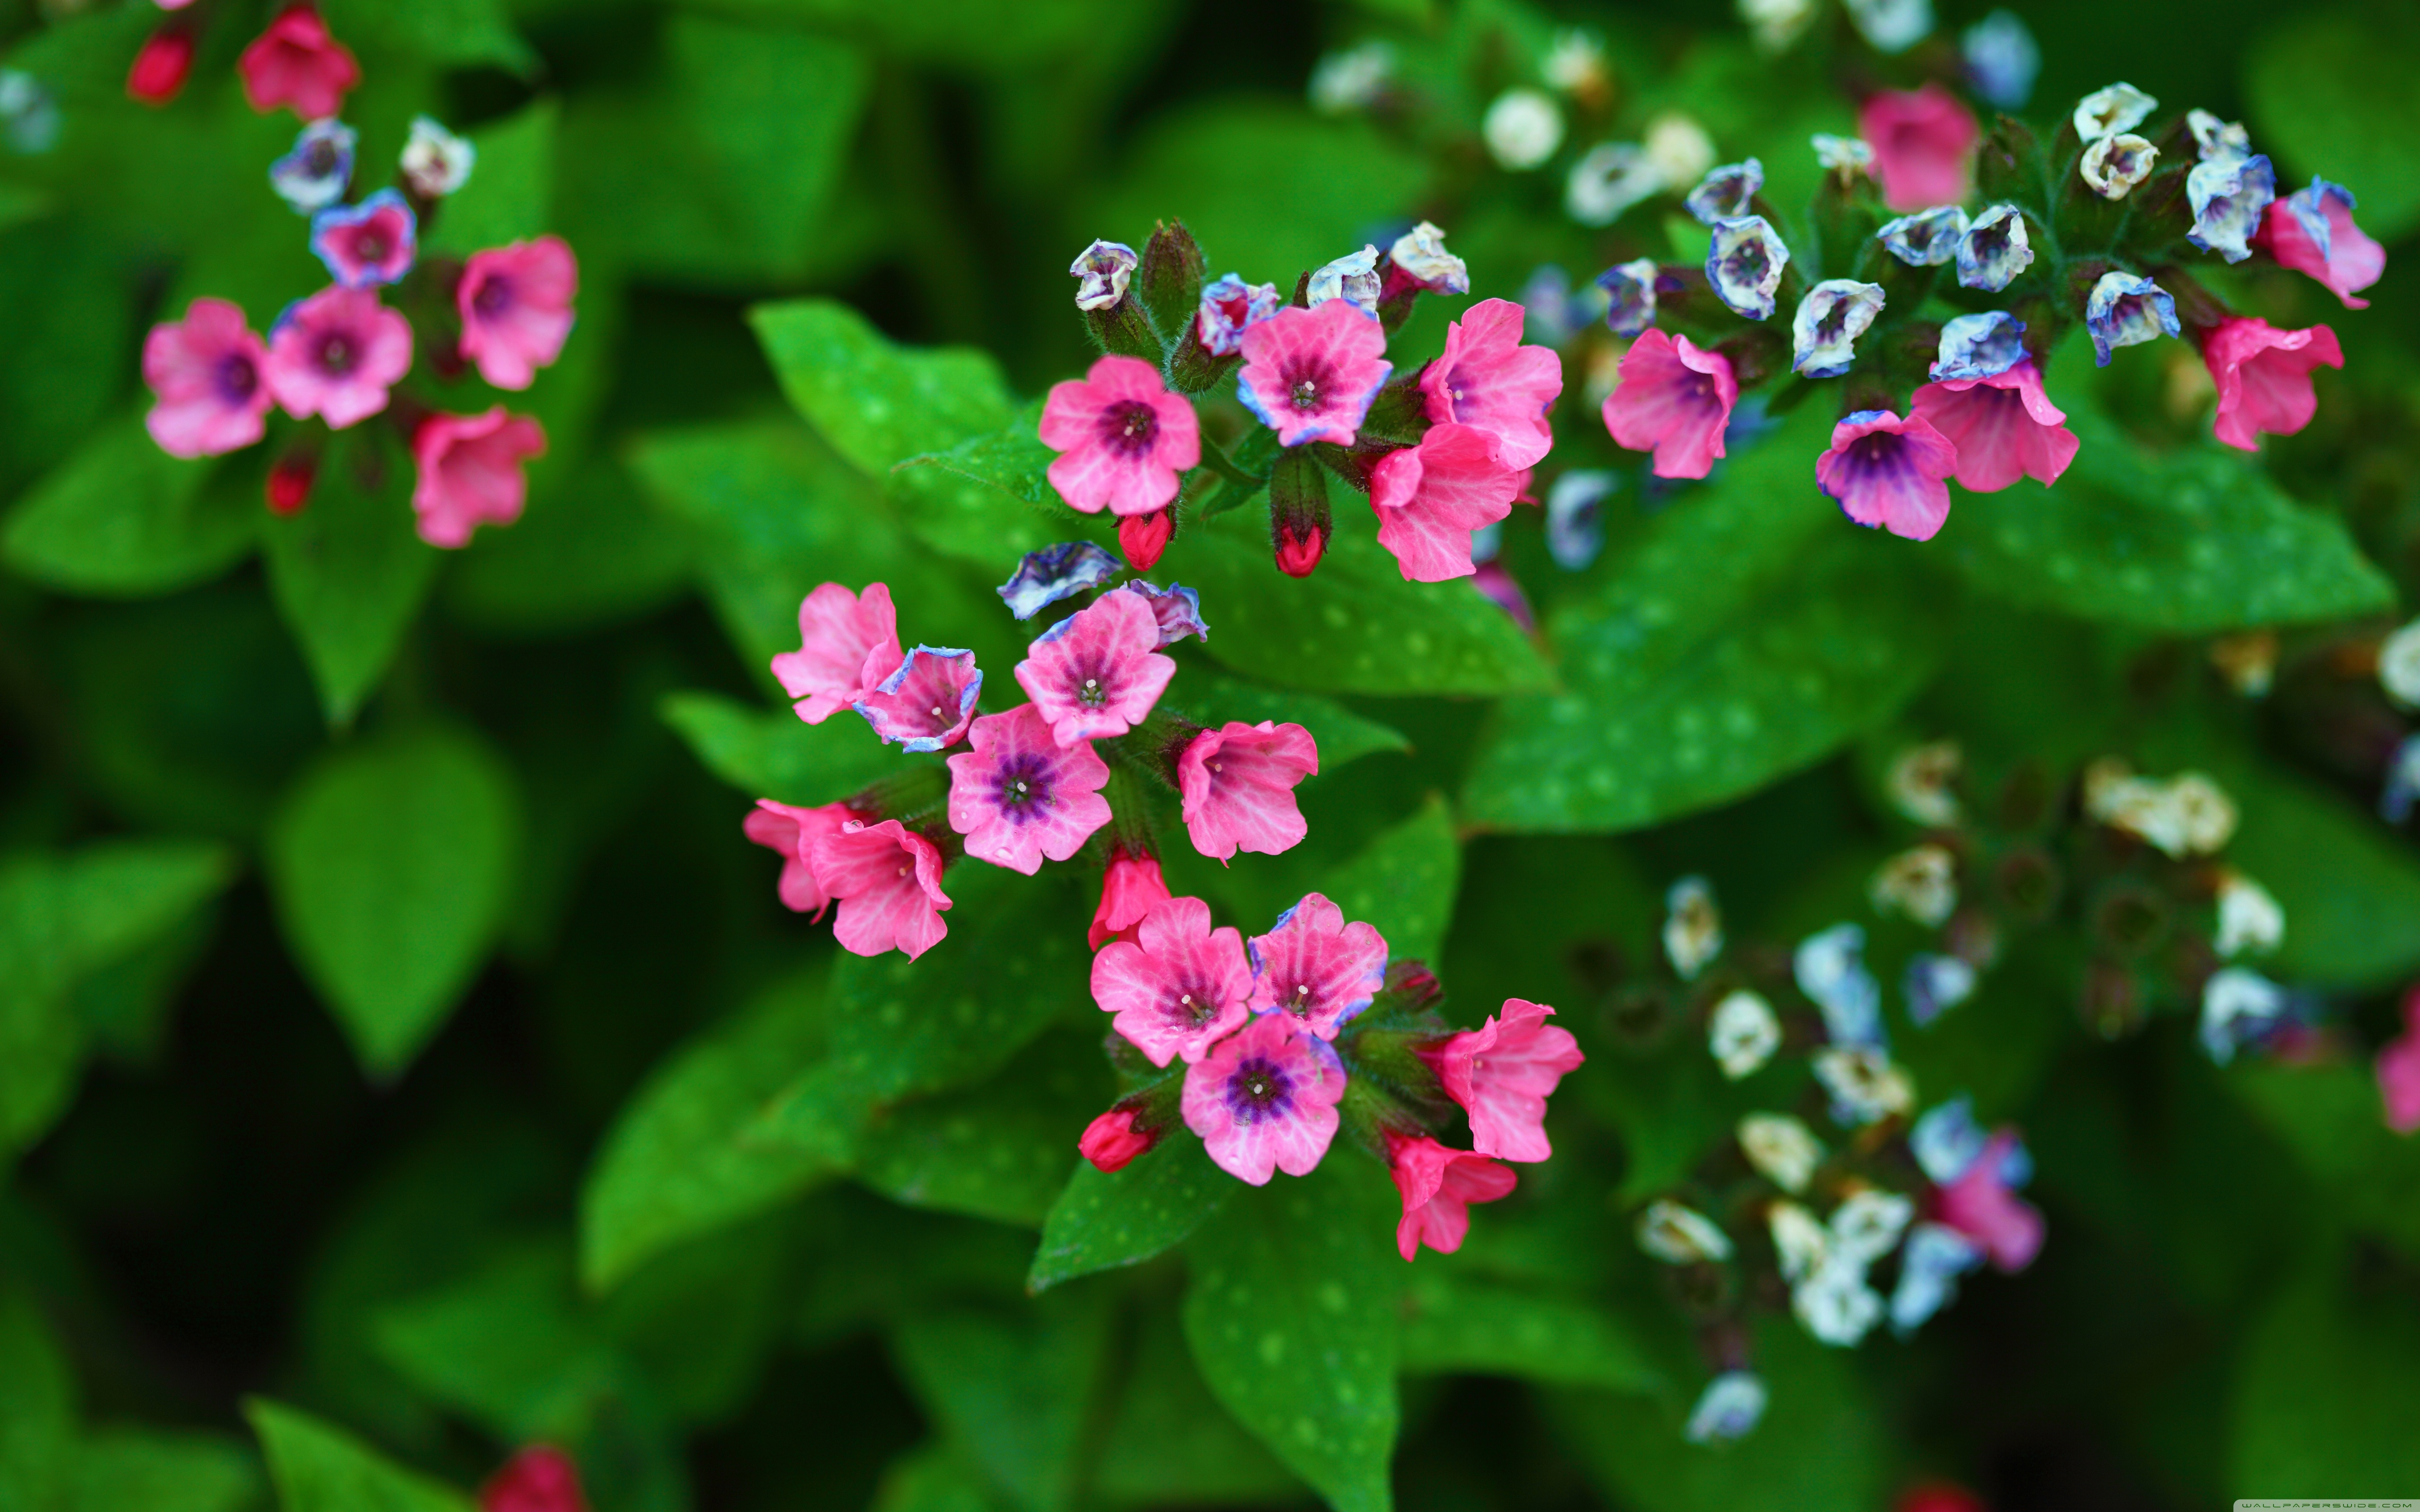 Mothers Day Screensavers Desktop: May Flowers Free Wallpaper